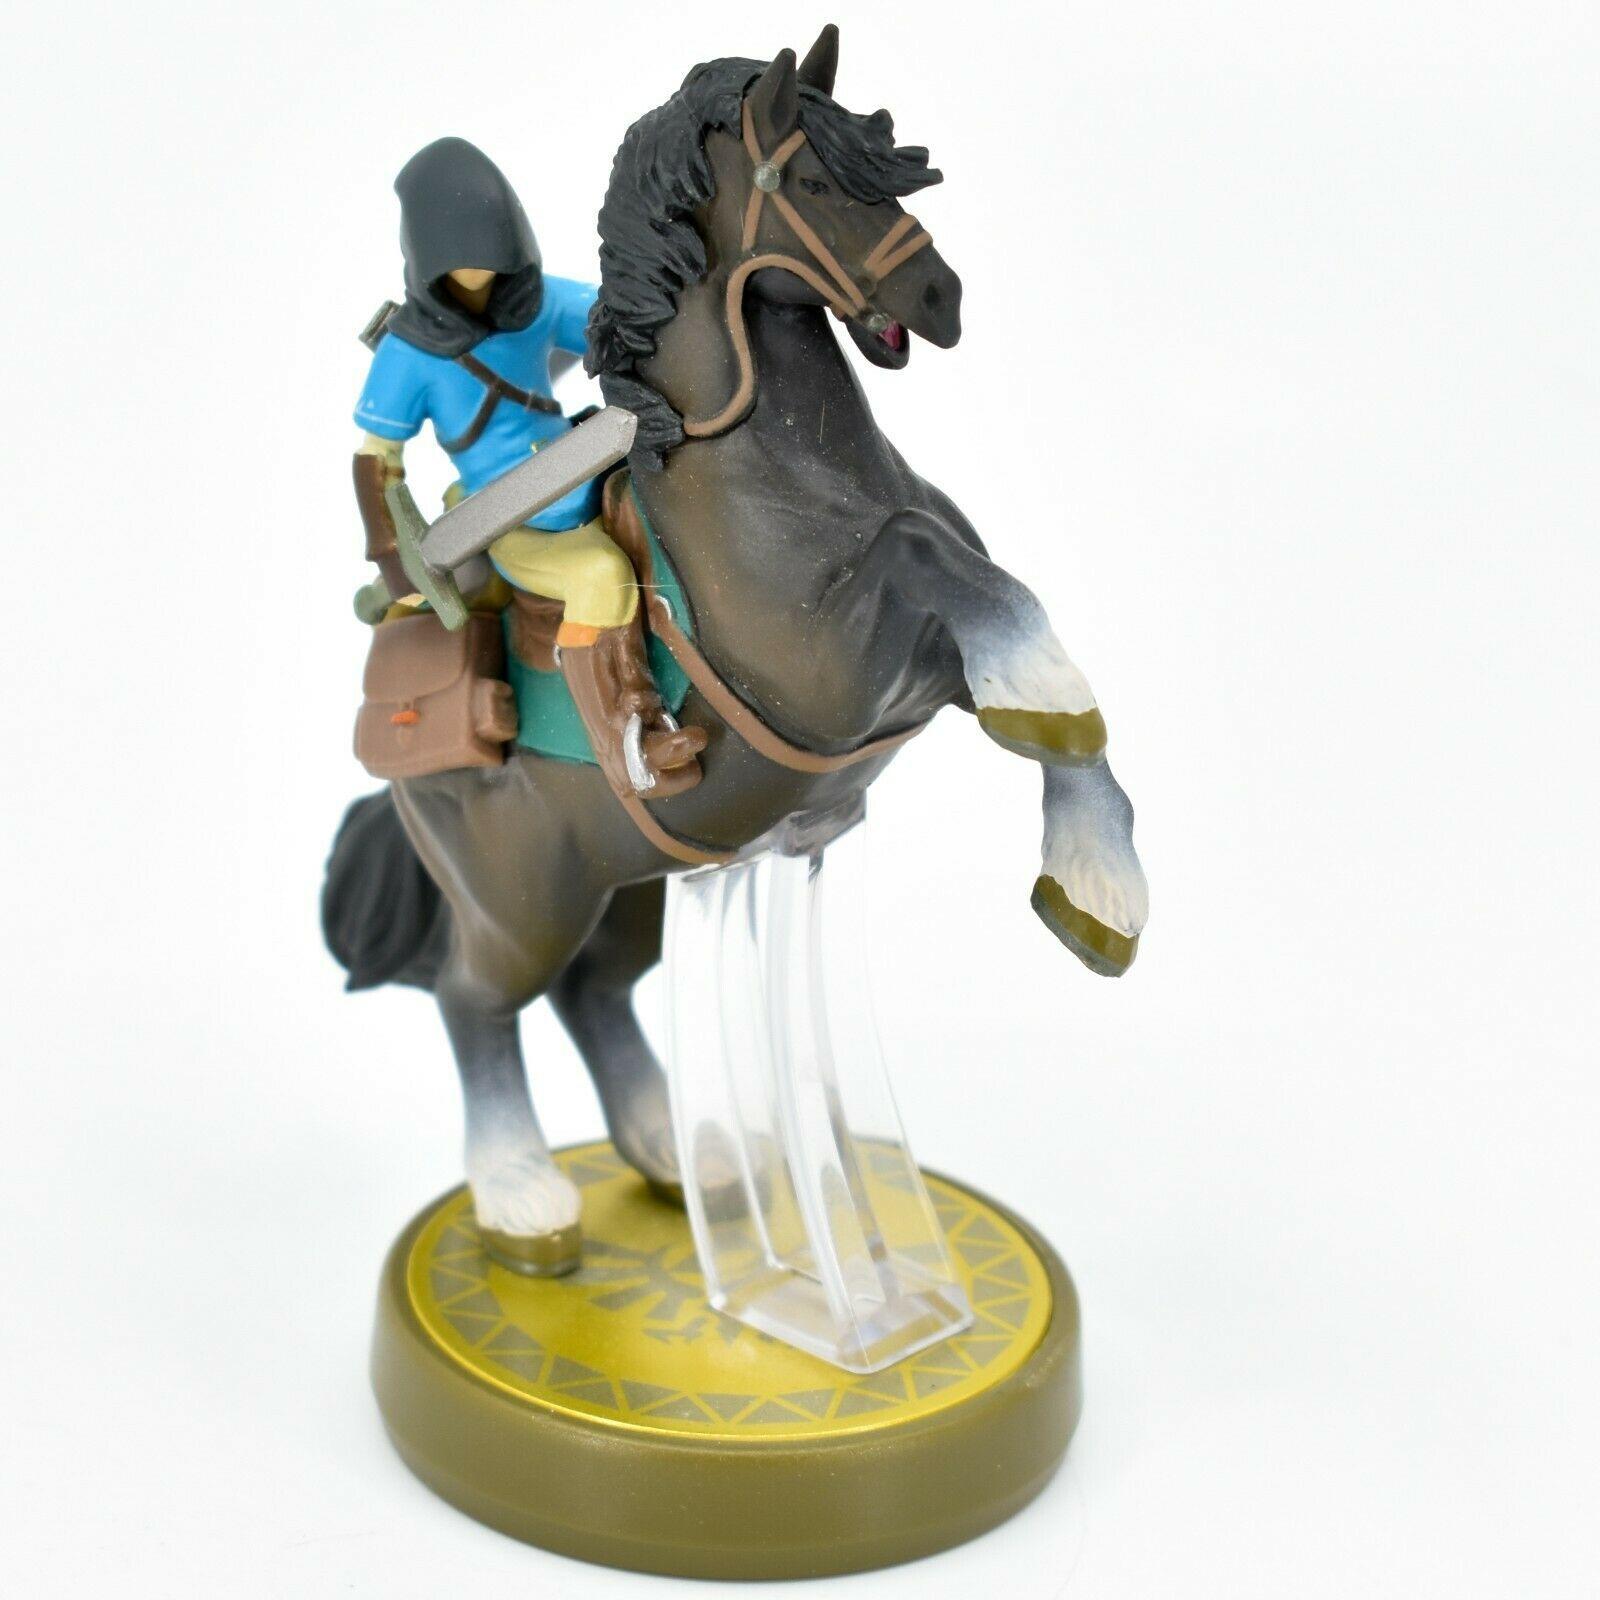 Nintendo The Legend of Zelda Breath of the Wild Link Hooded Rider Loose Amiibo